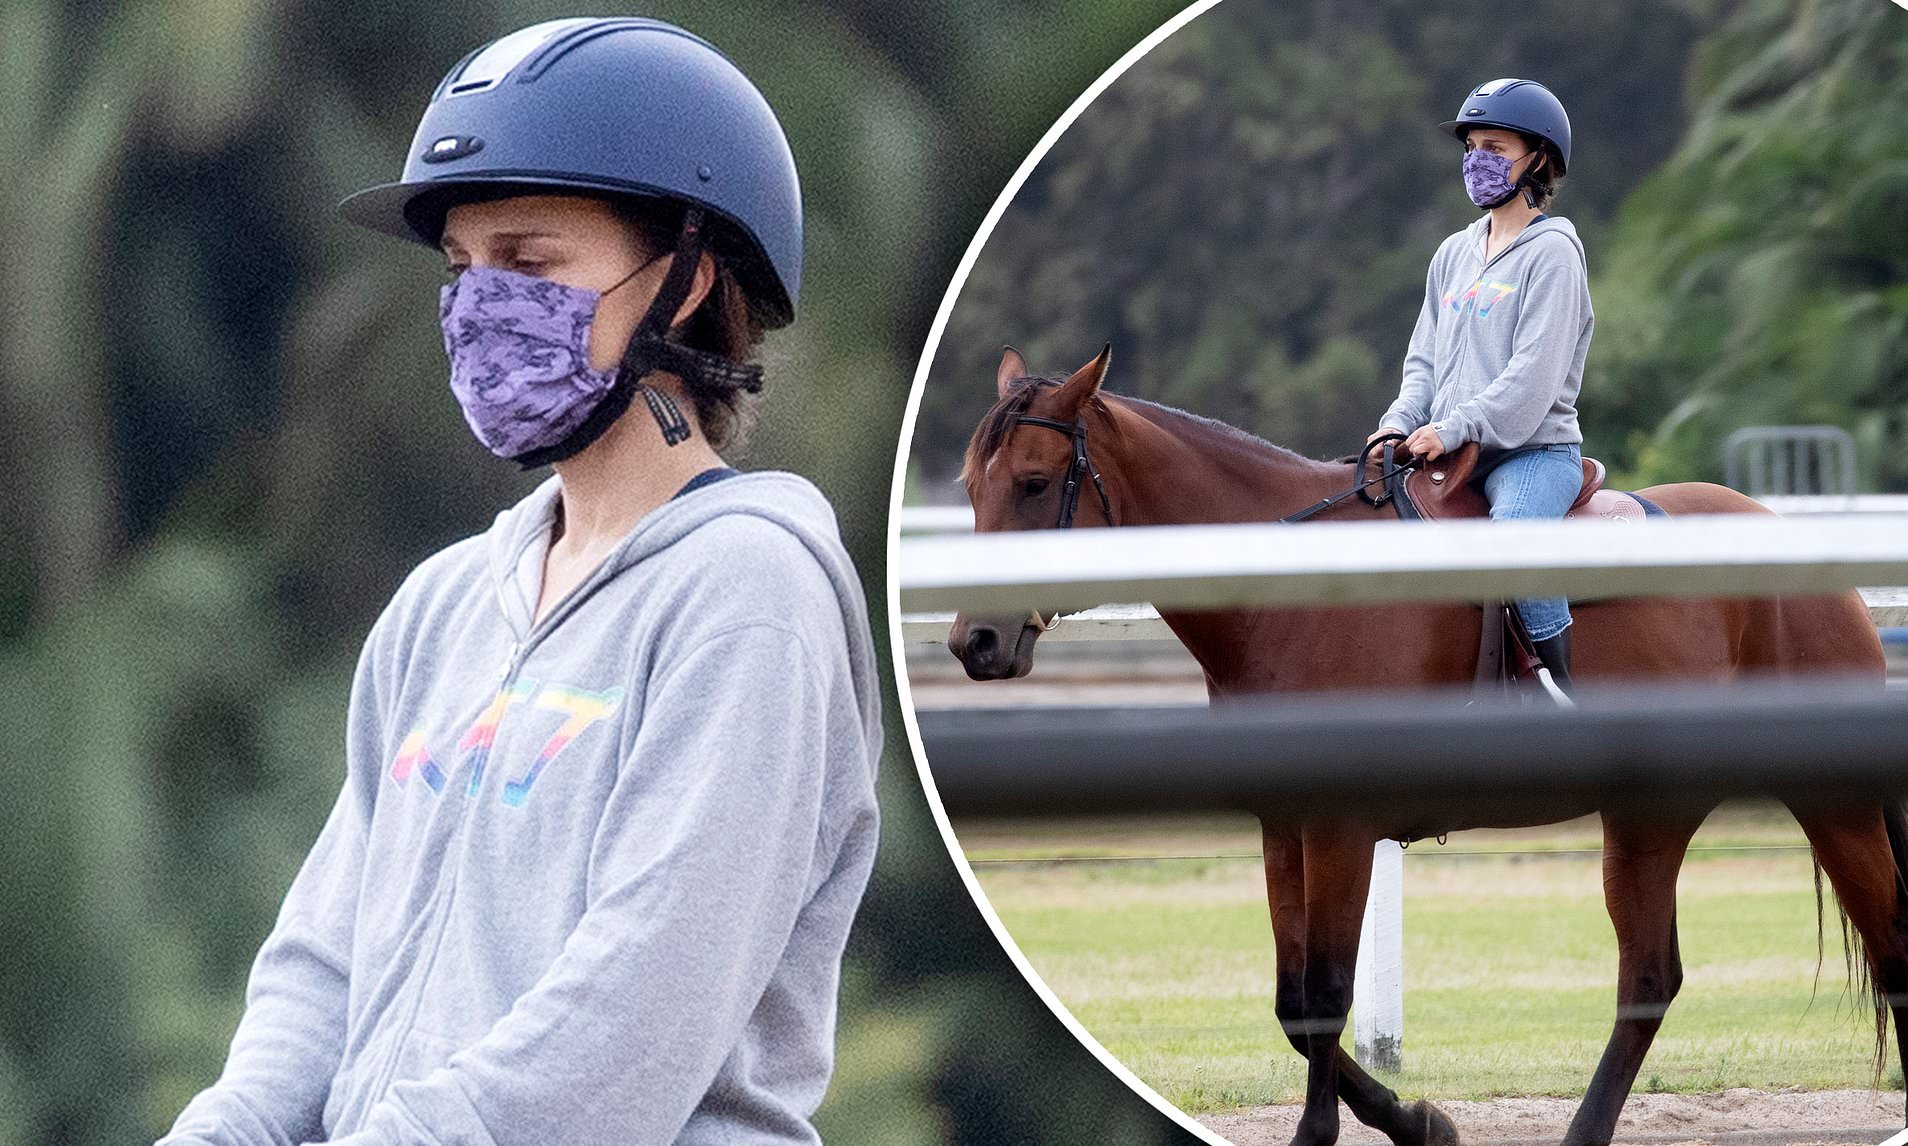 Natalie Portman Horses